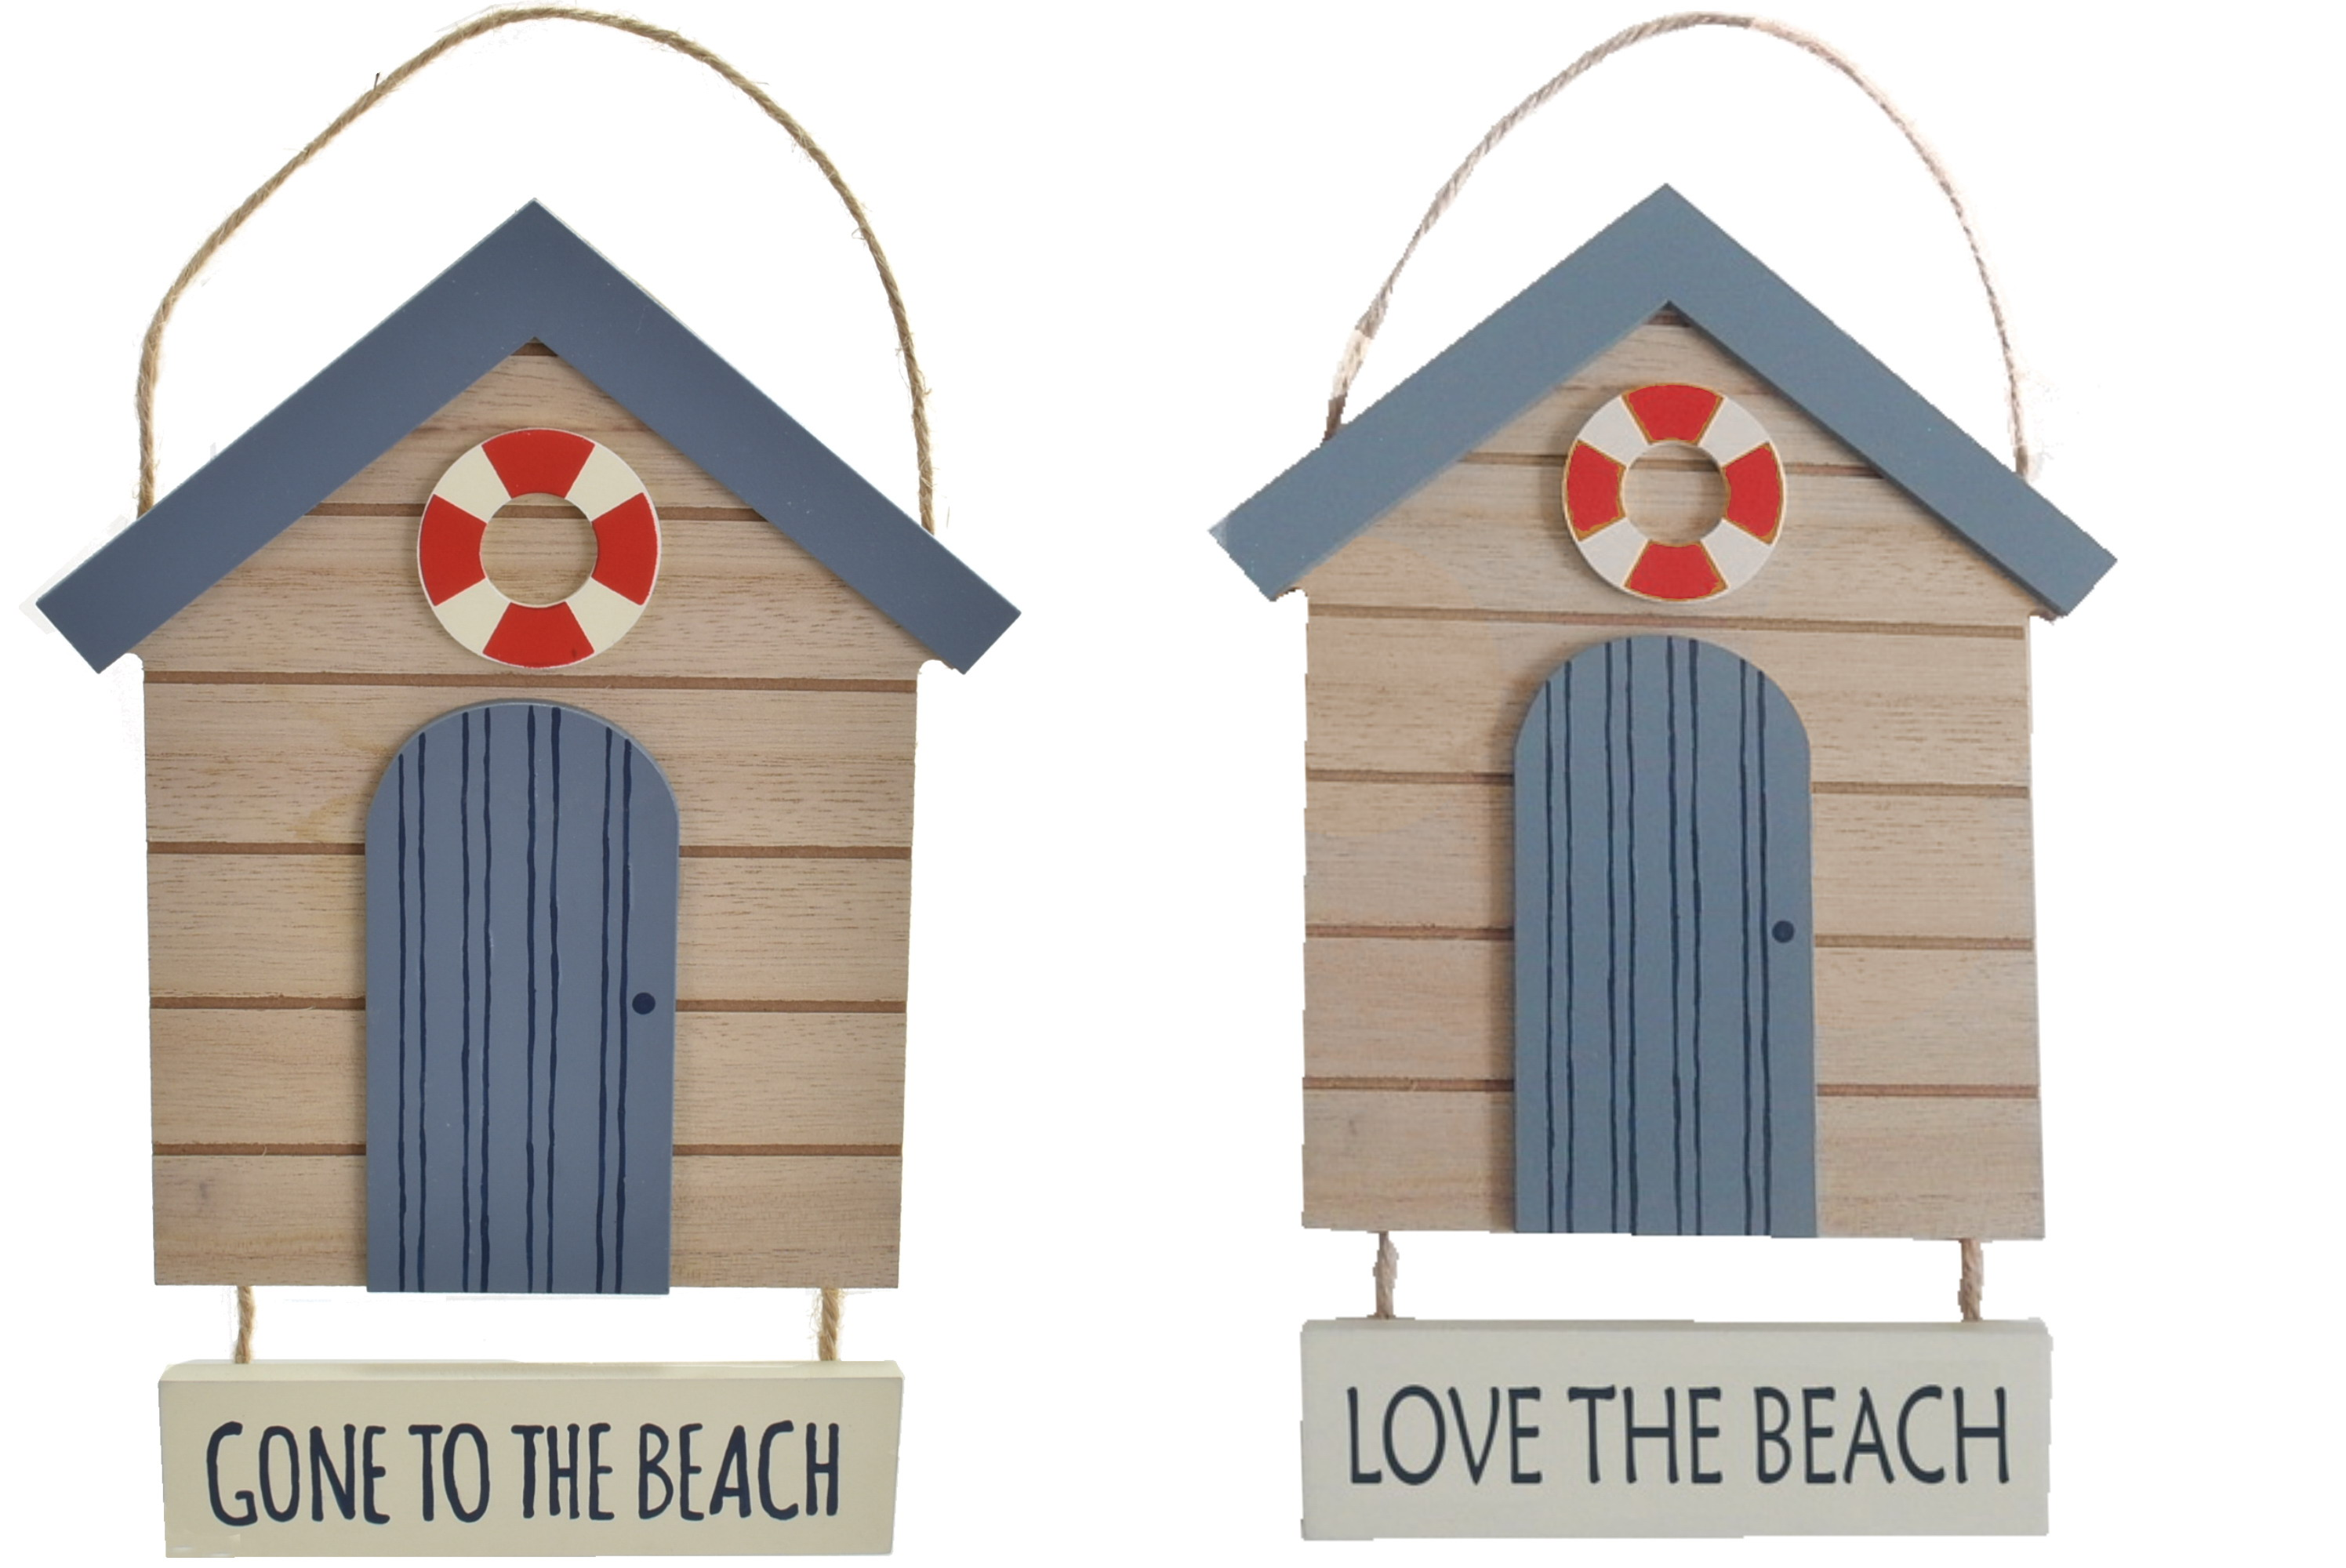 24x15cm Hanging Beach Hut Sign 2 Assorted